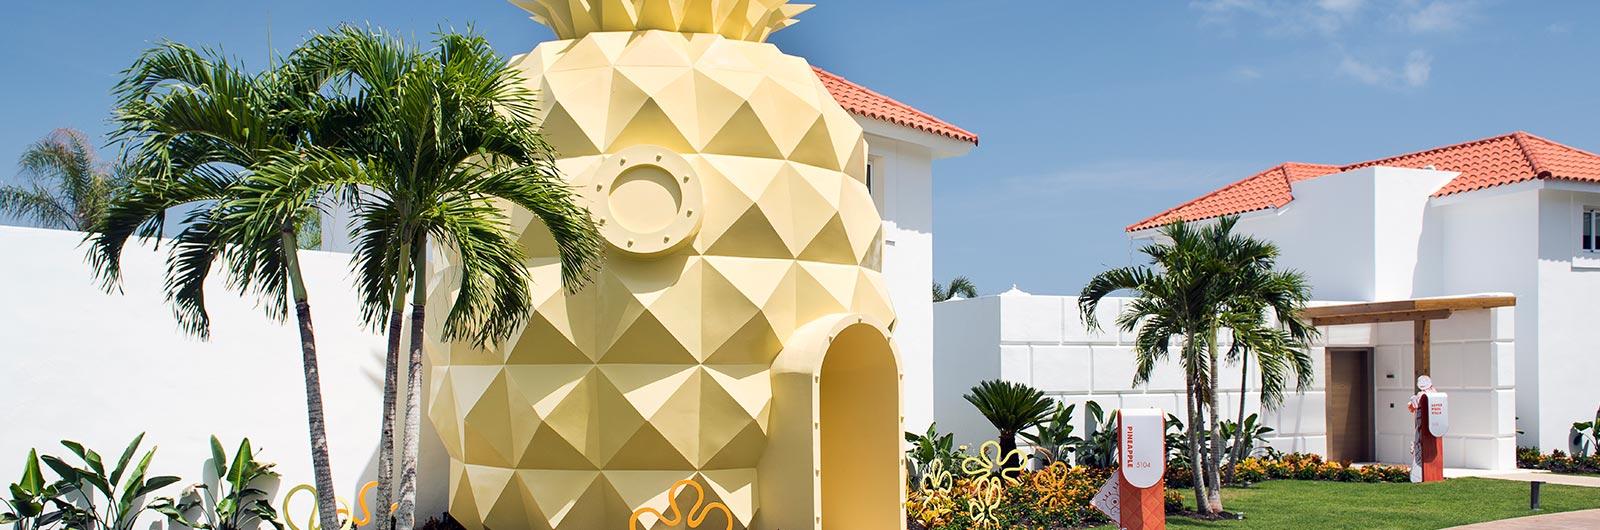 accomodations-page_pineapple_2_nhpc_1600x530